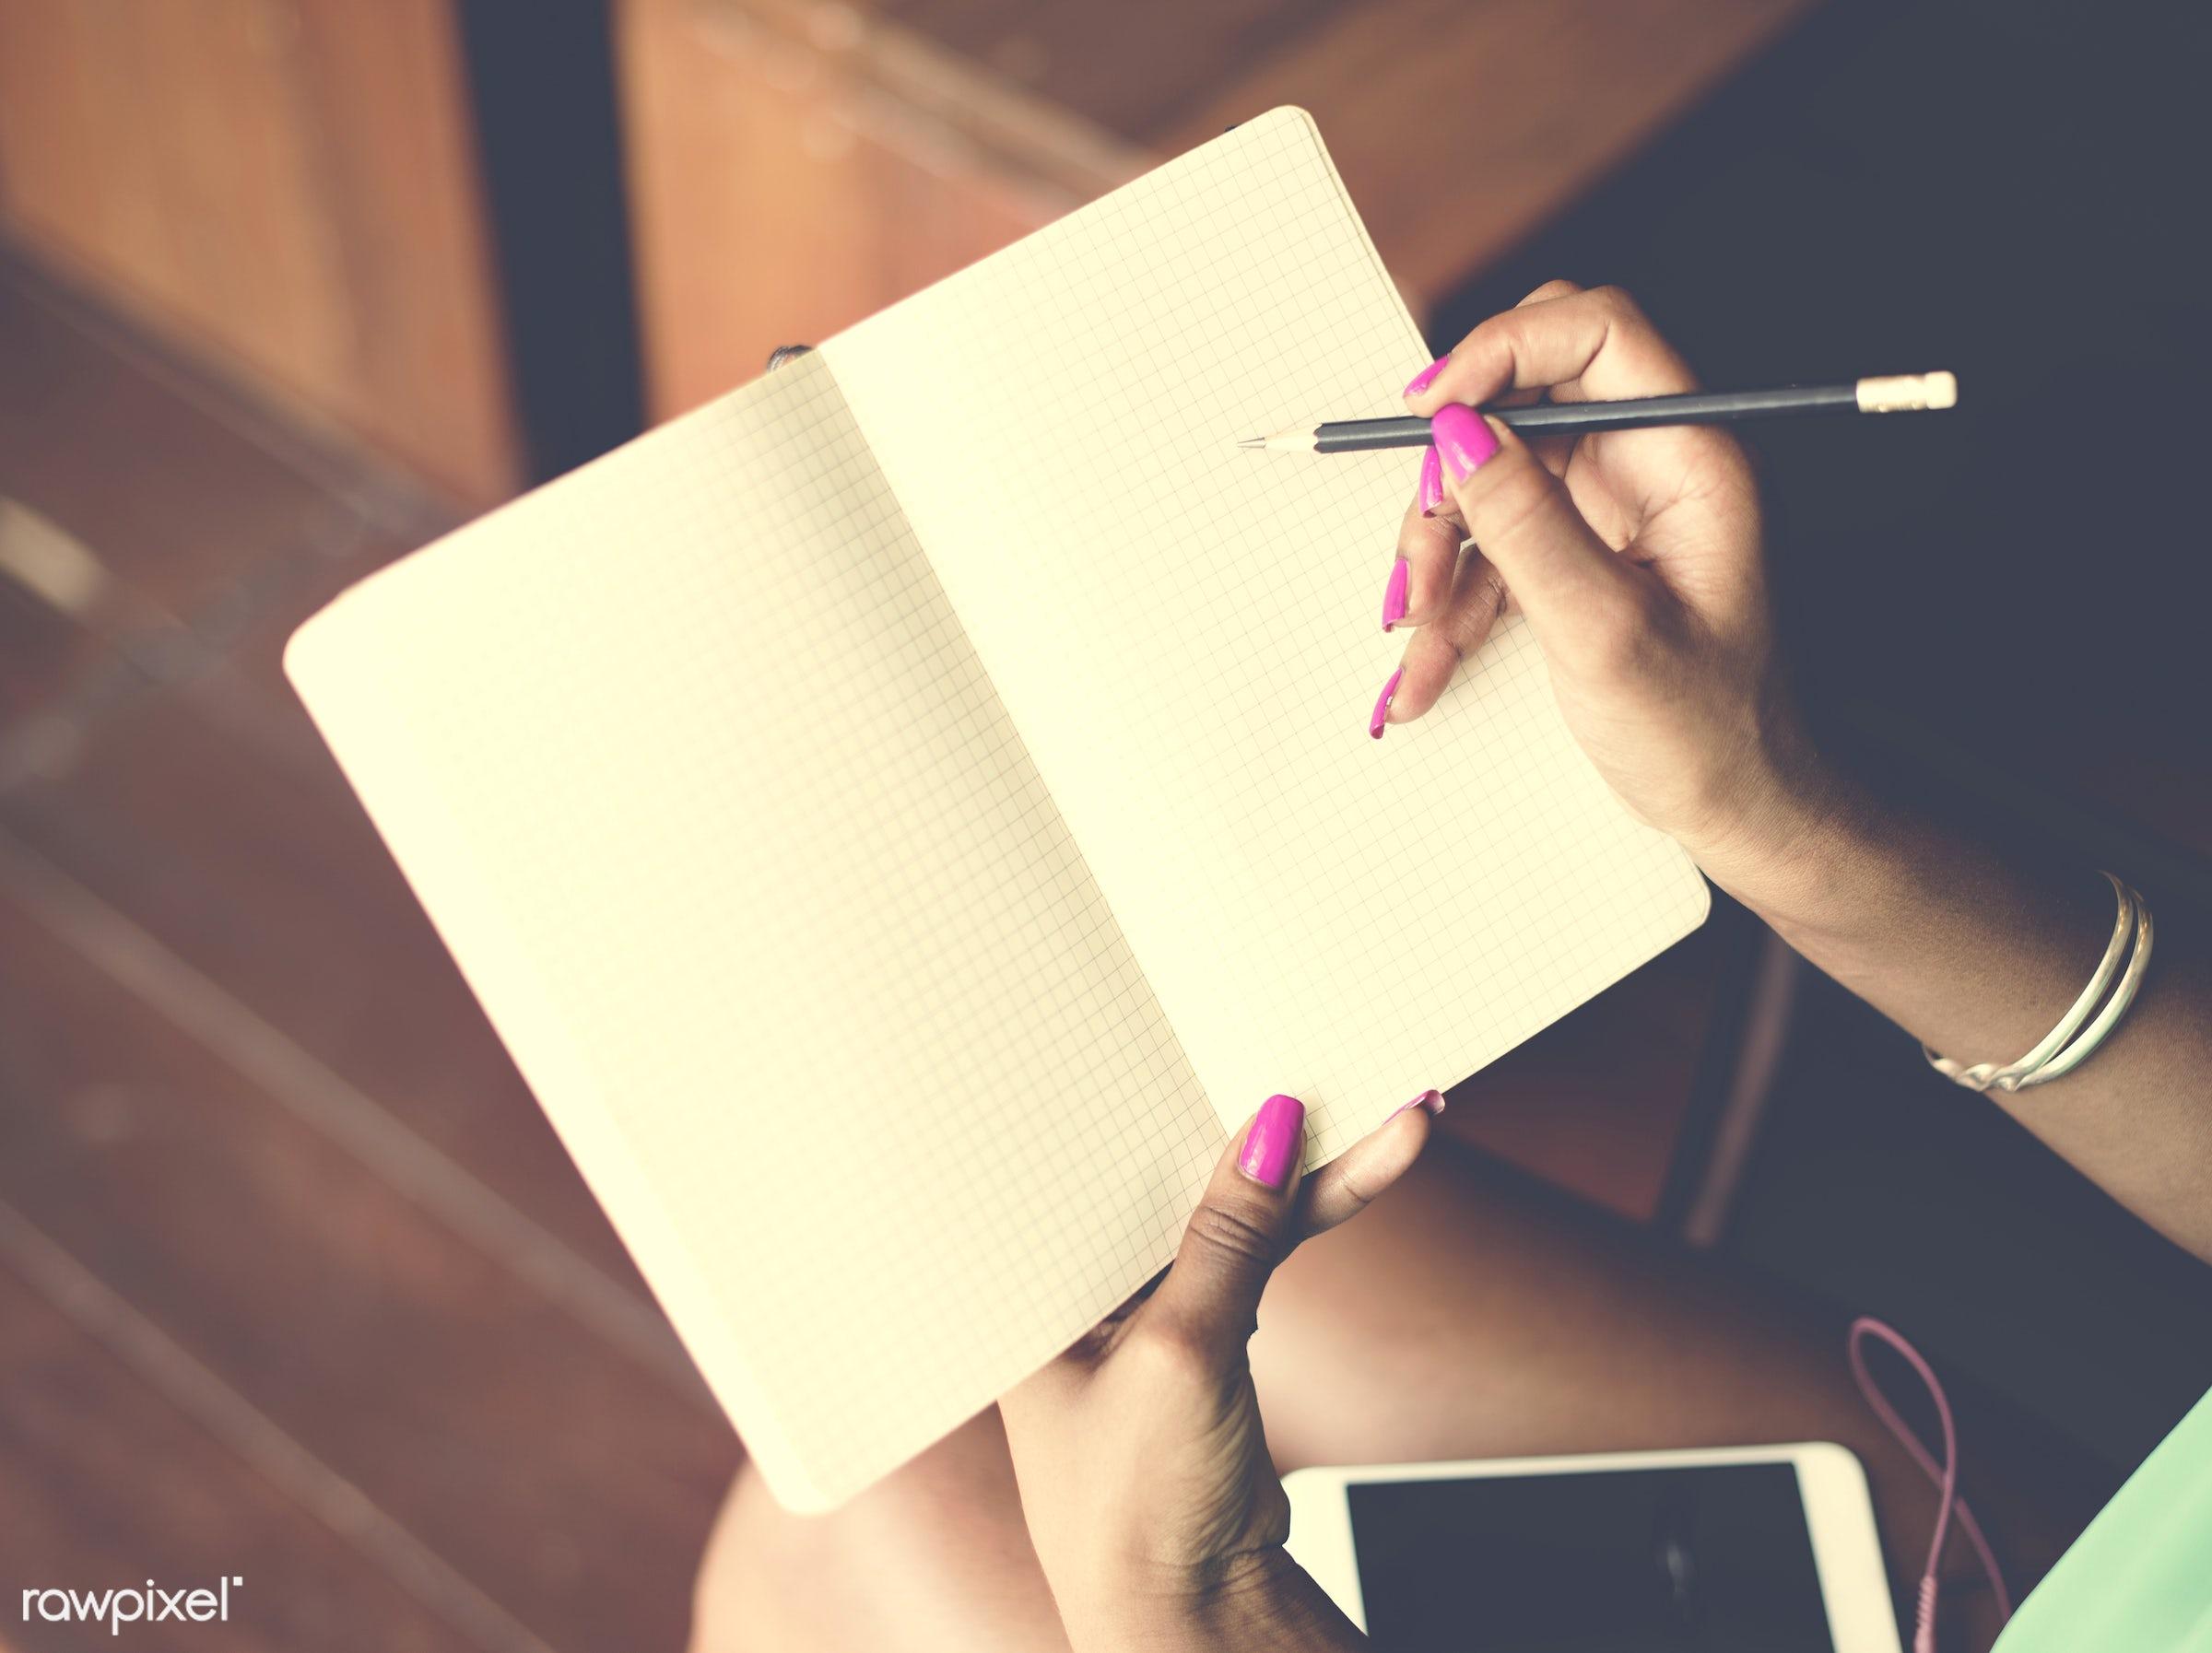 blank, creative, creativity, design, designer, documents, draft, drafting, drawing, flat, hand, ideas, line, notebook,...